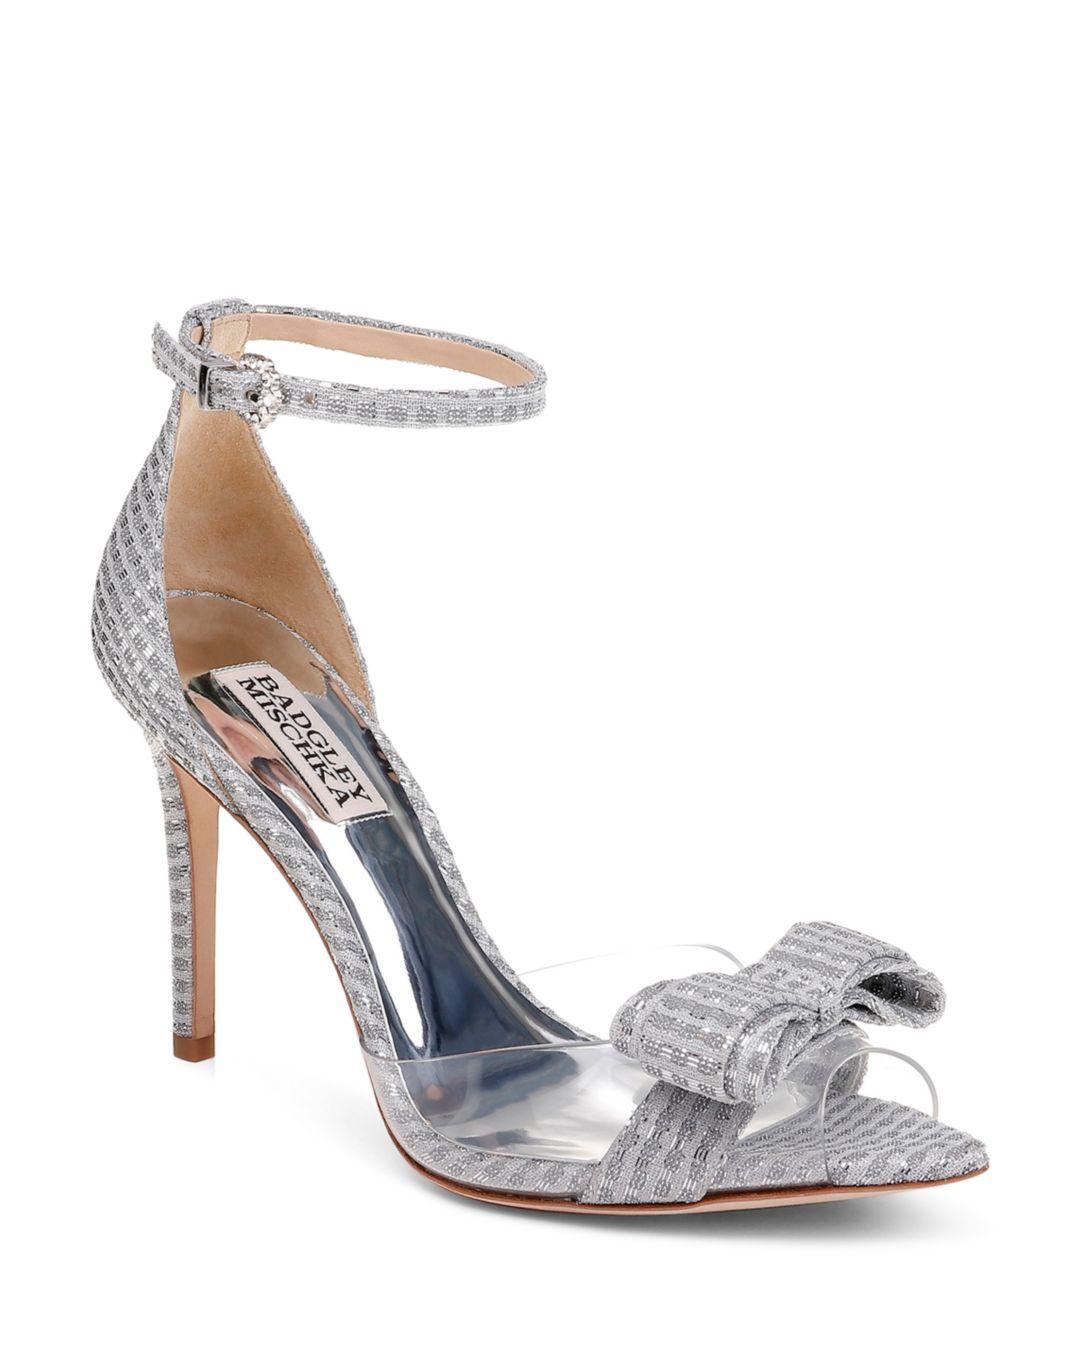 1adecf4219 Badgley Mischka Women's Lindsay Clear Peep Toe Pumps in Metallic ...